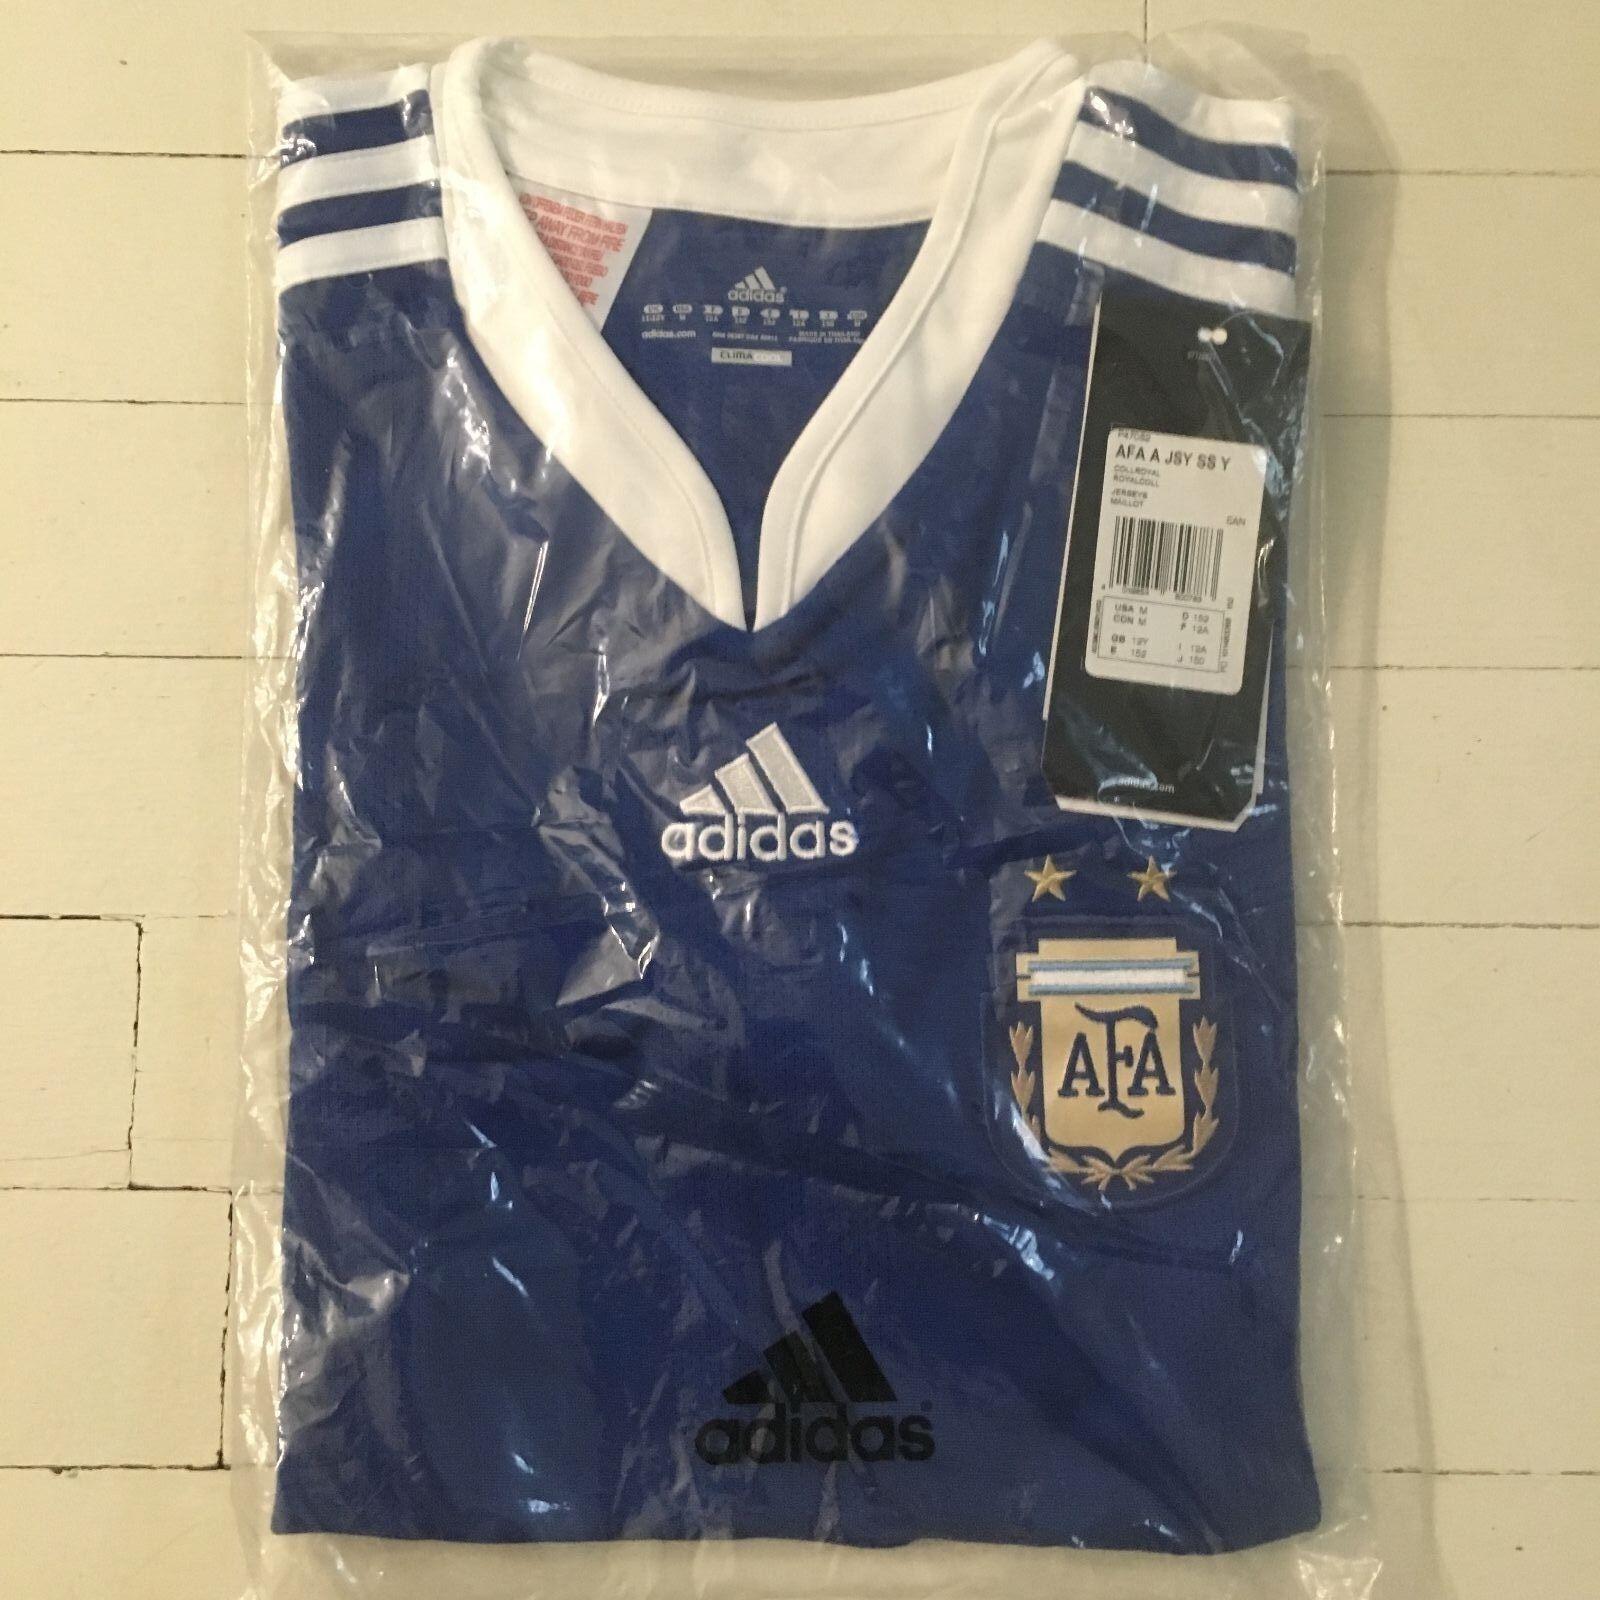 Adidas silverINA  Youth M Medium Kids Soccer Jersey ⚽️ NEW Official Replica